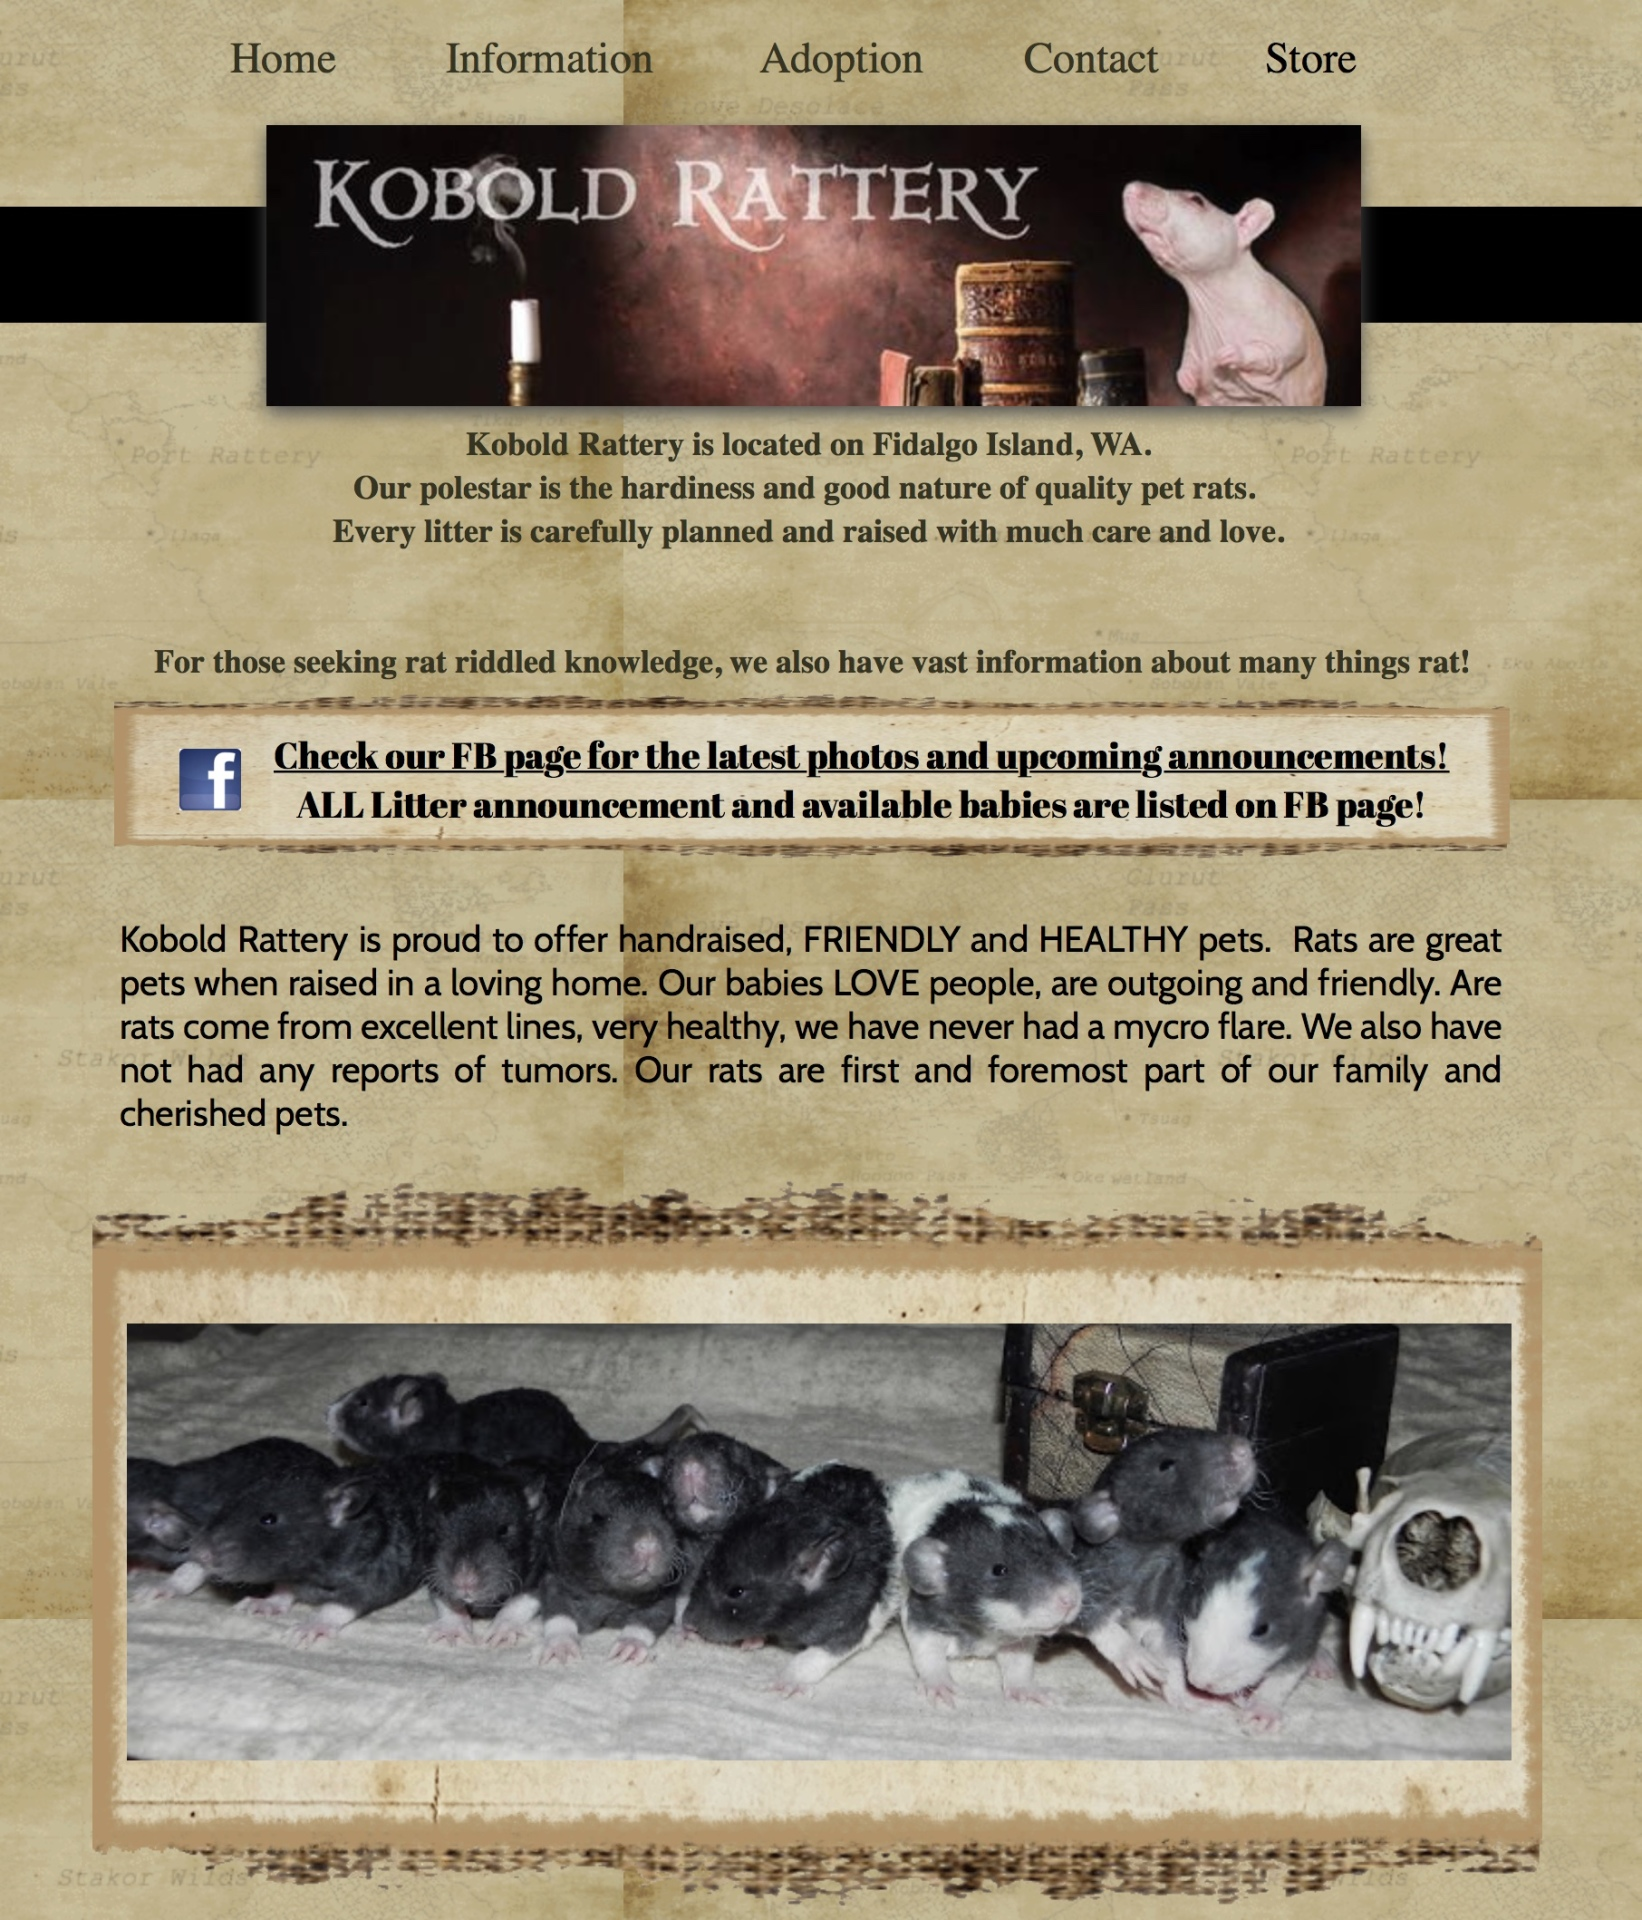 Kobold Rattery